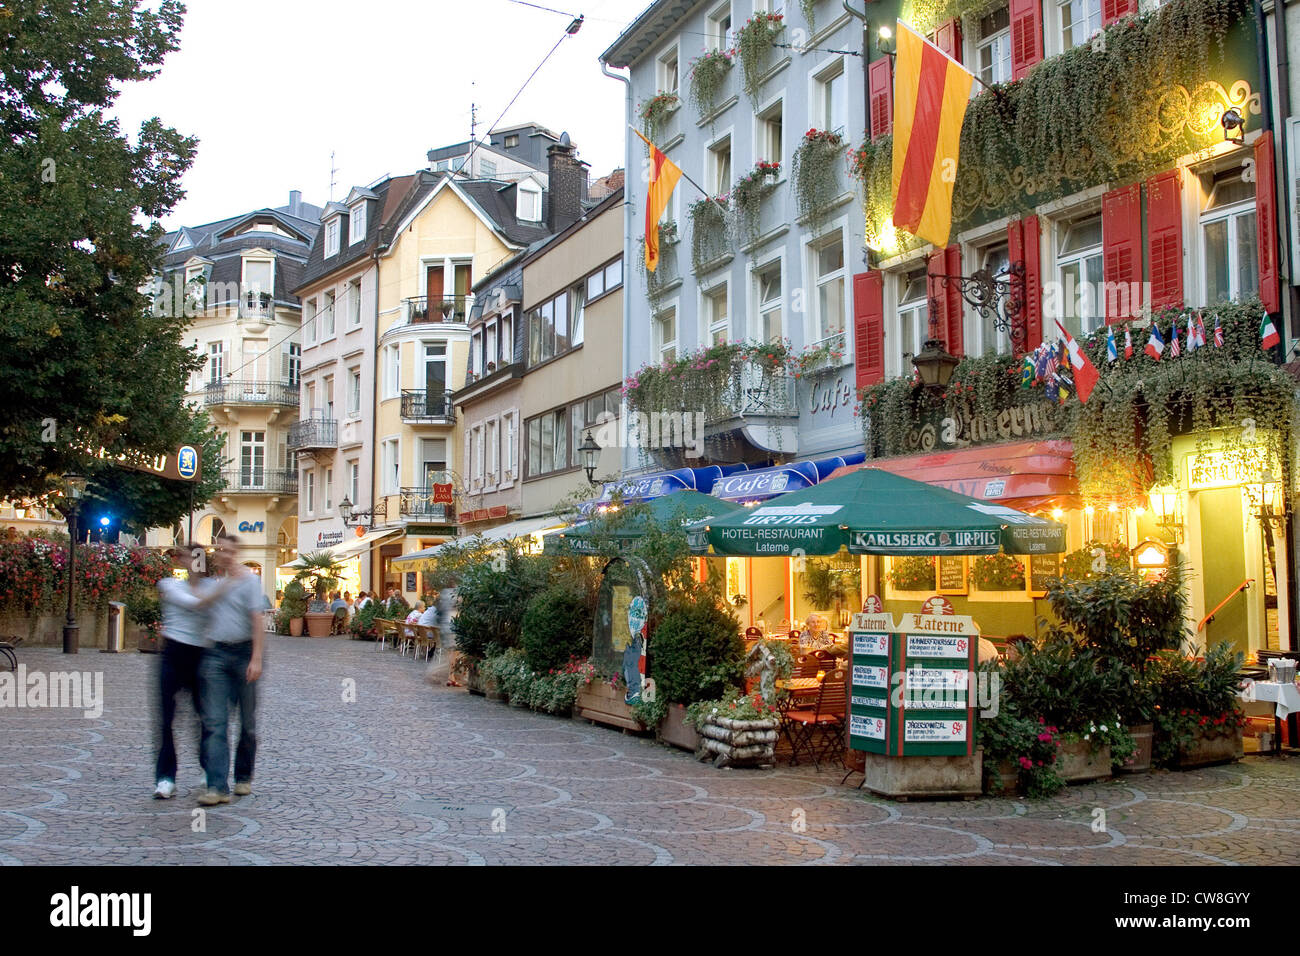 Baden baden regardez les rues du centre ville banque d 39 images photo stock 49976079 alamy - Office du tourisme baden baden ...